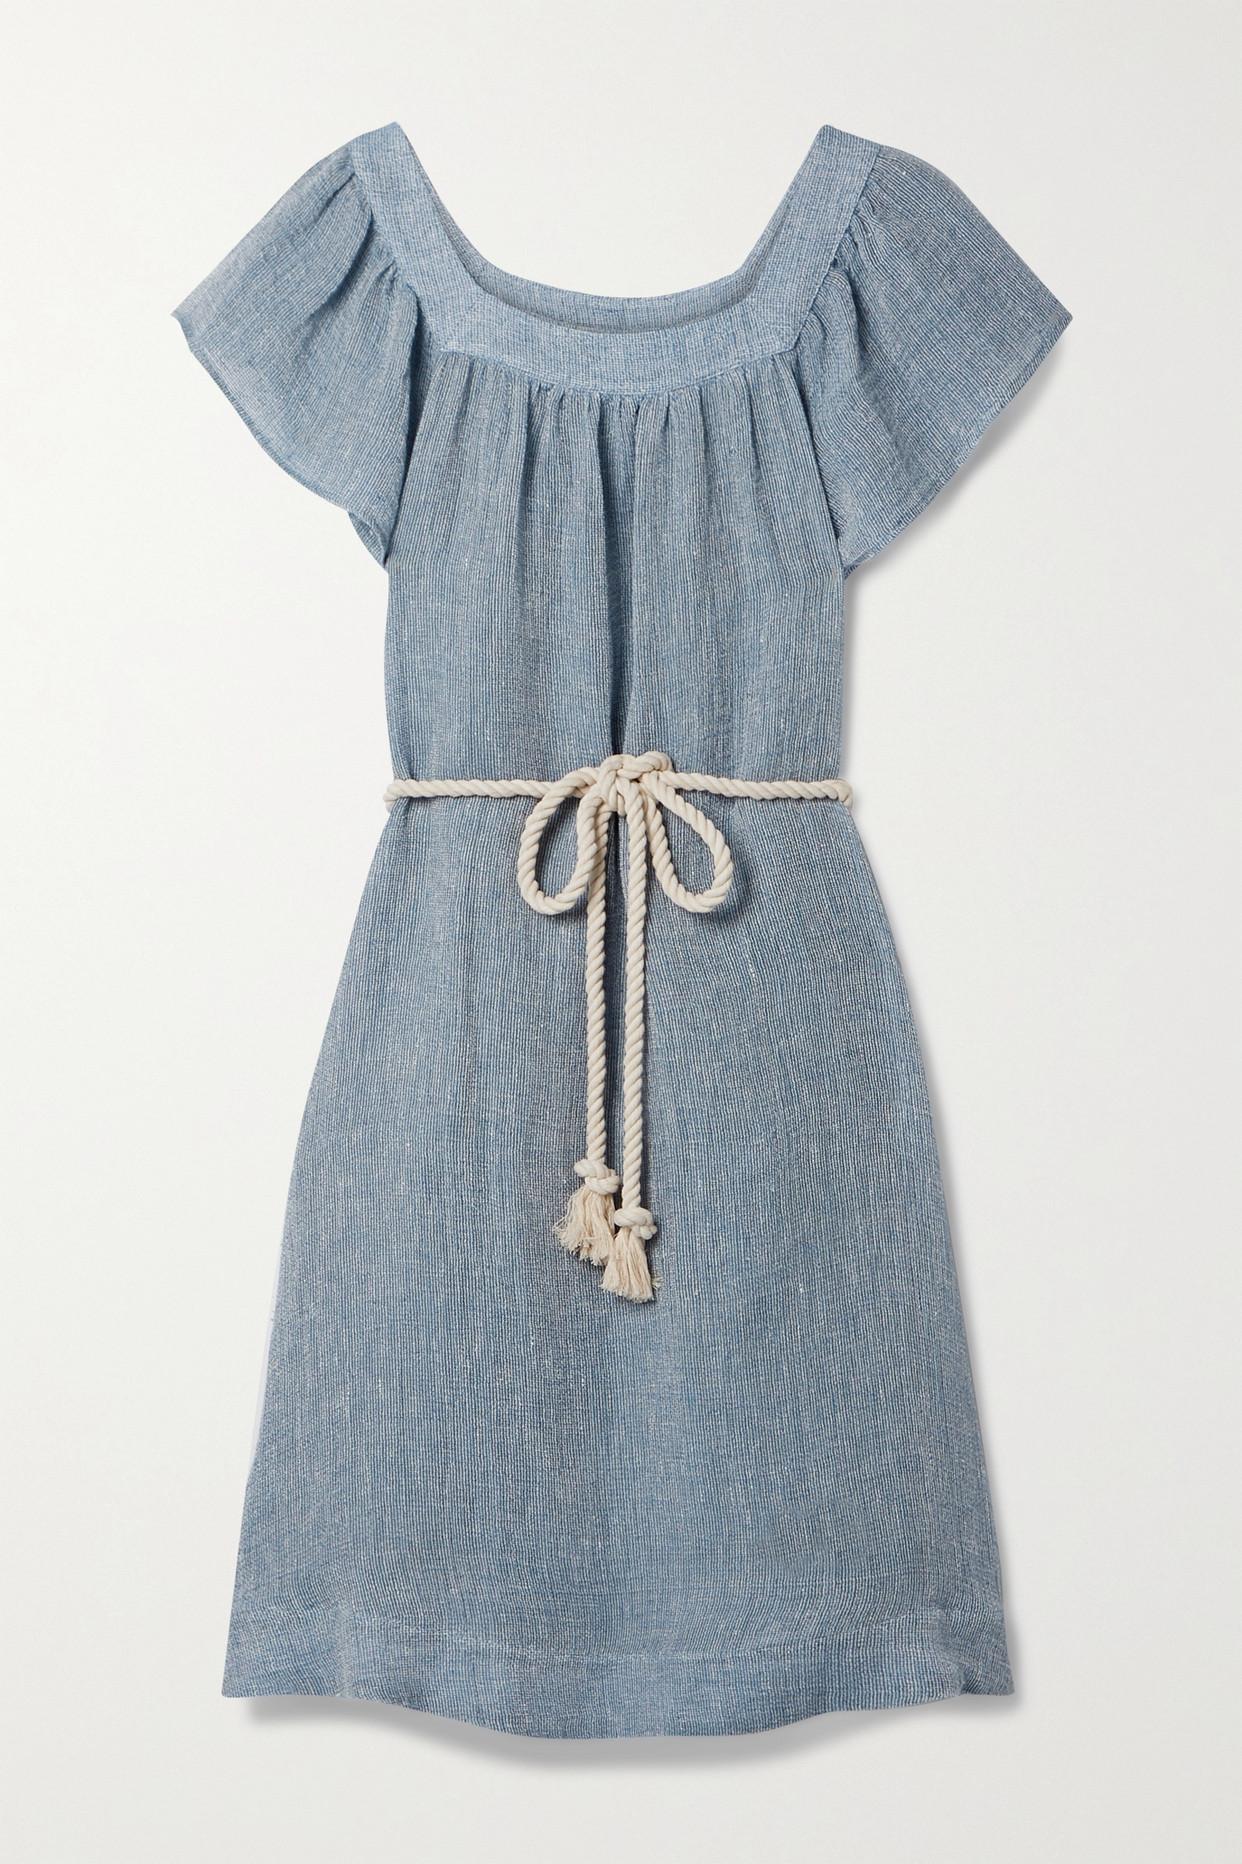 LISA MARIE FERNANDEZ - 【net Sustain】muu Muu 配腰带亚麻混纺薄纱中长连衣裙 - 蓝色 - 3